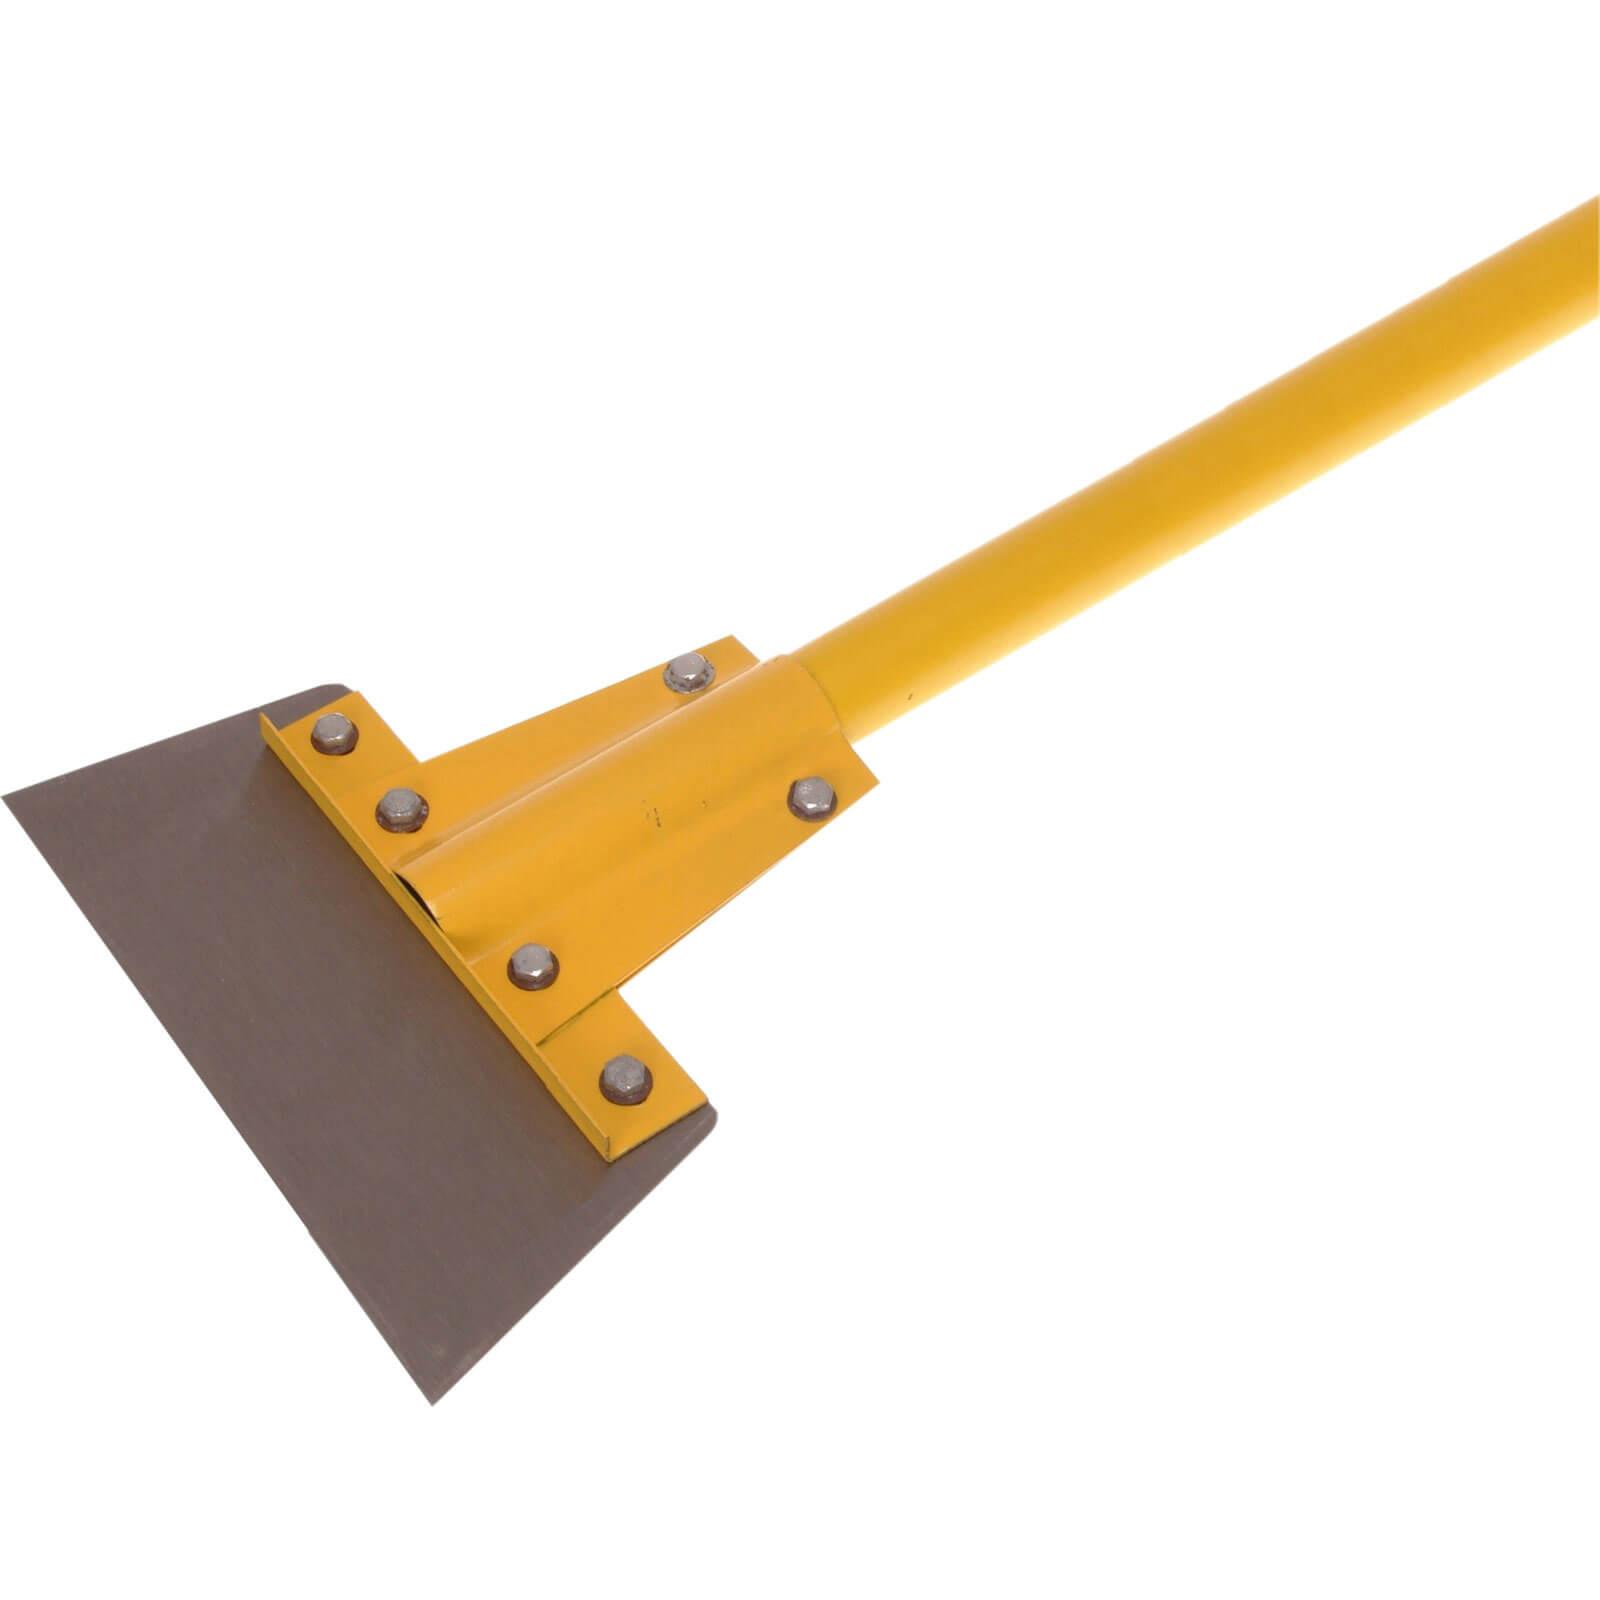 "Faithfull 8"" Floor Scraper With 48"" Fibreglass Handle"